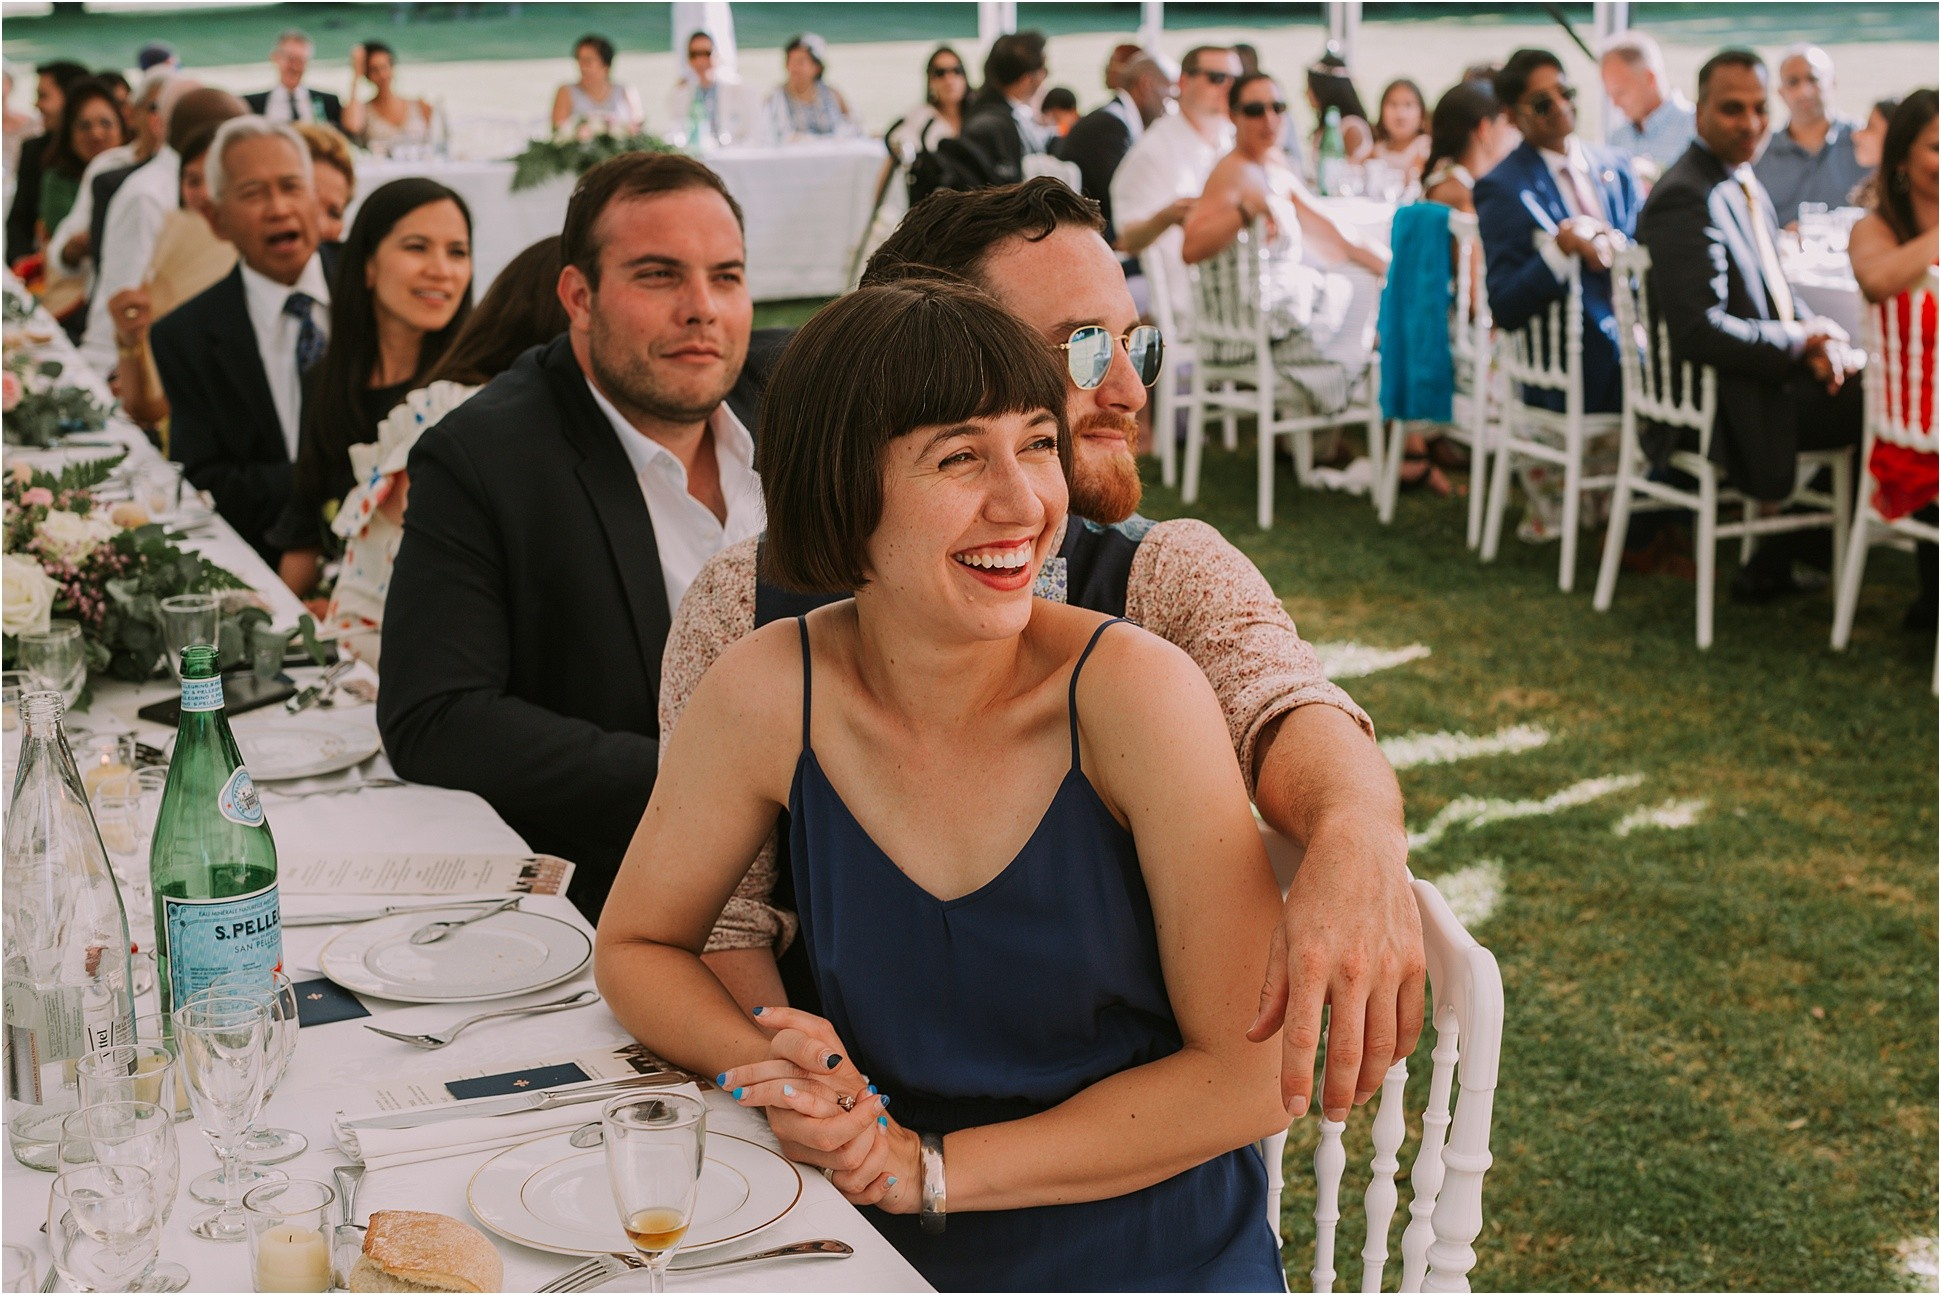 Kateryna-photos-photographe-mariage-chateau-st-paterne-mayenne-normandie_0132.jpg